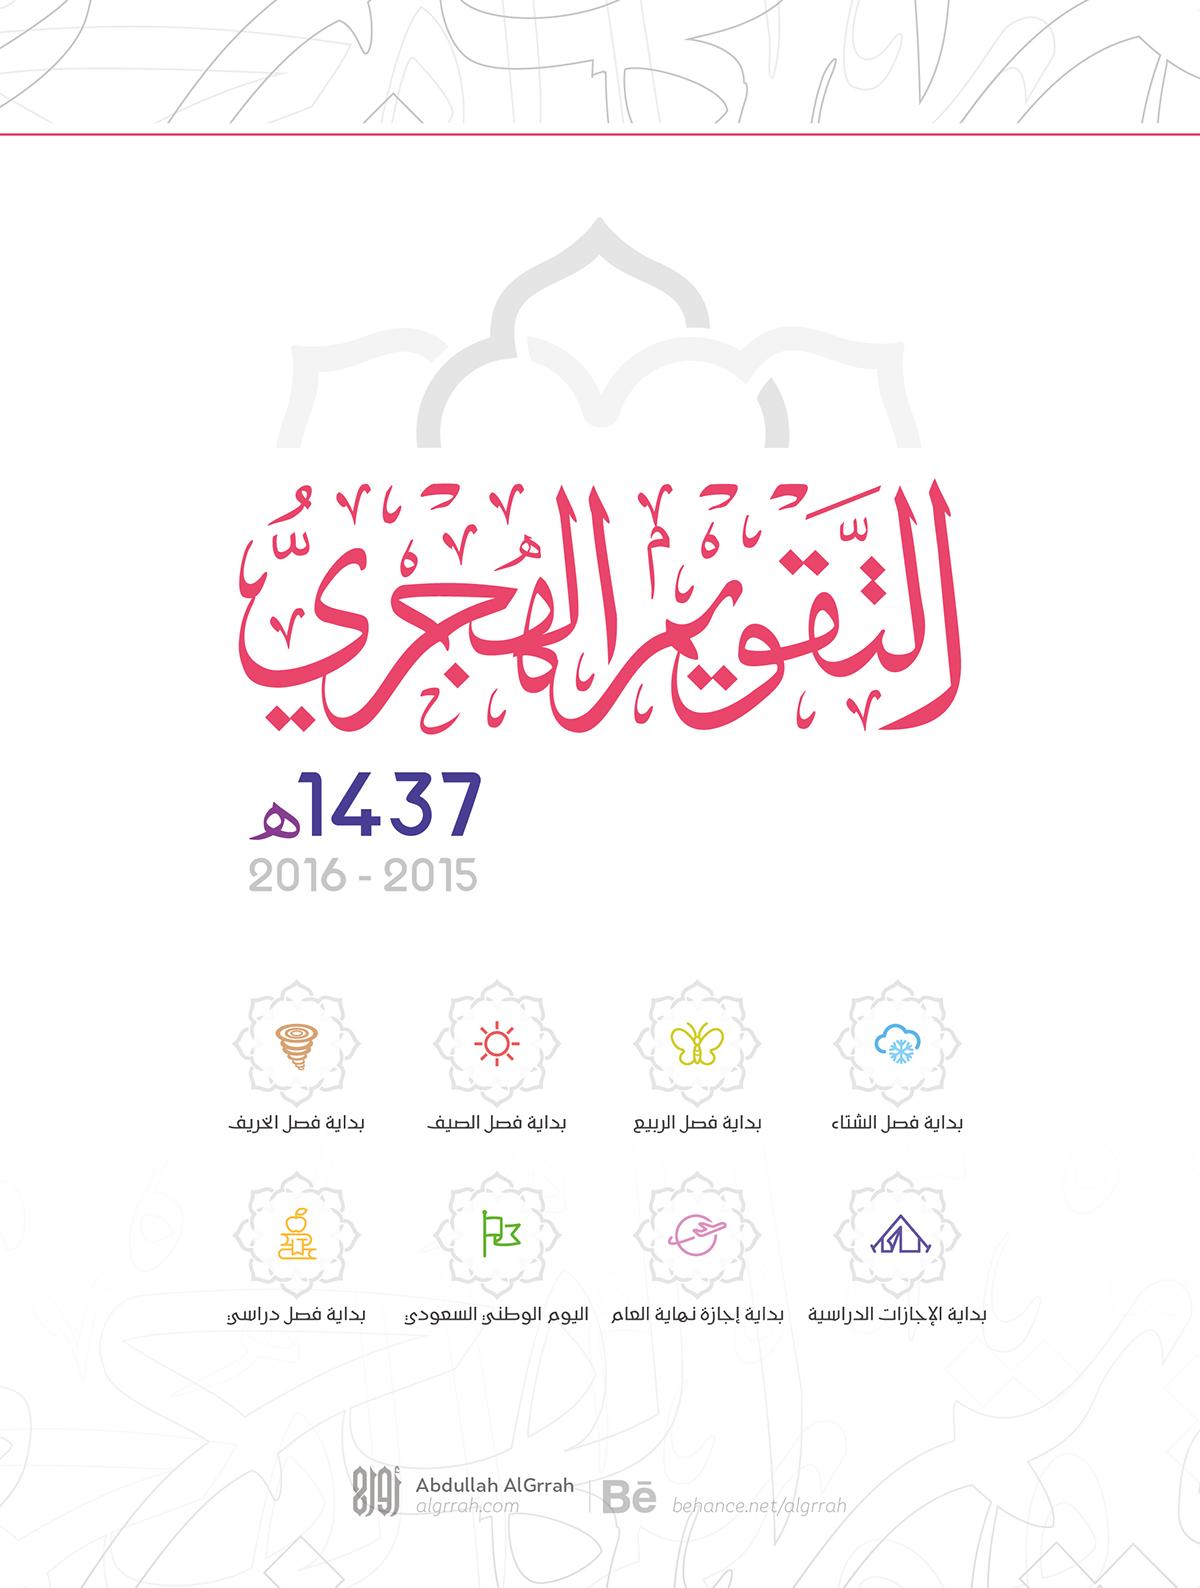 تقويم,calendar,1437هـ